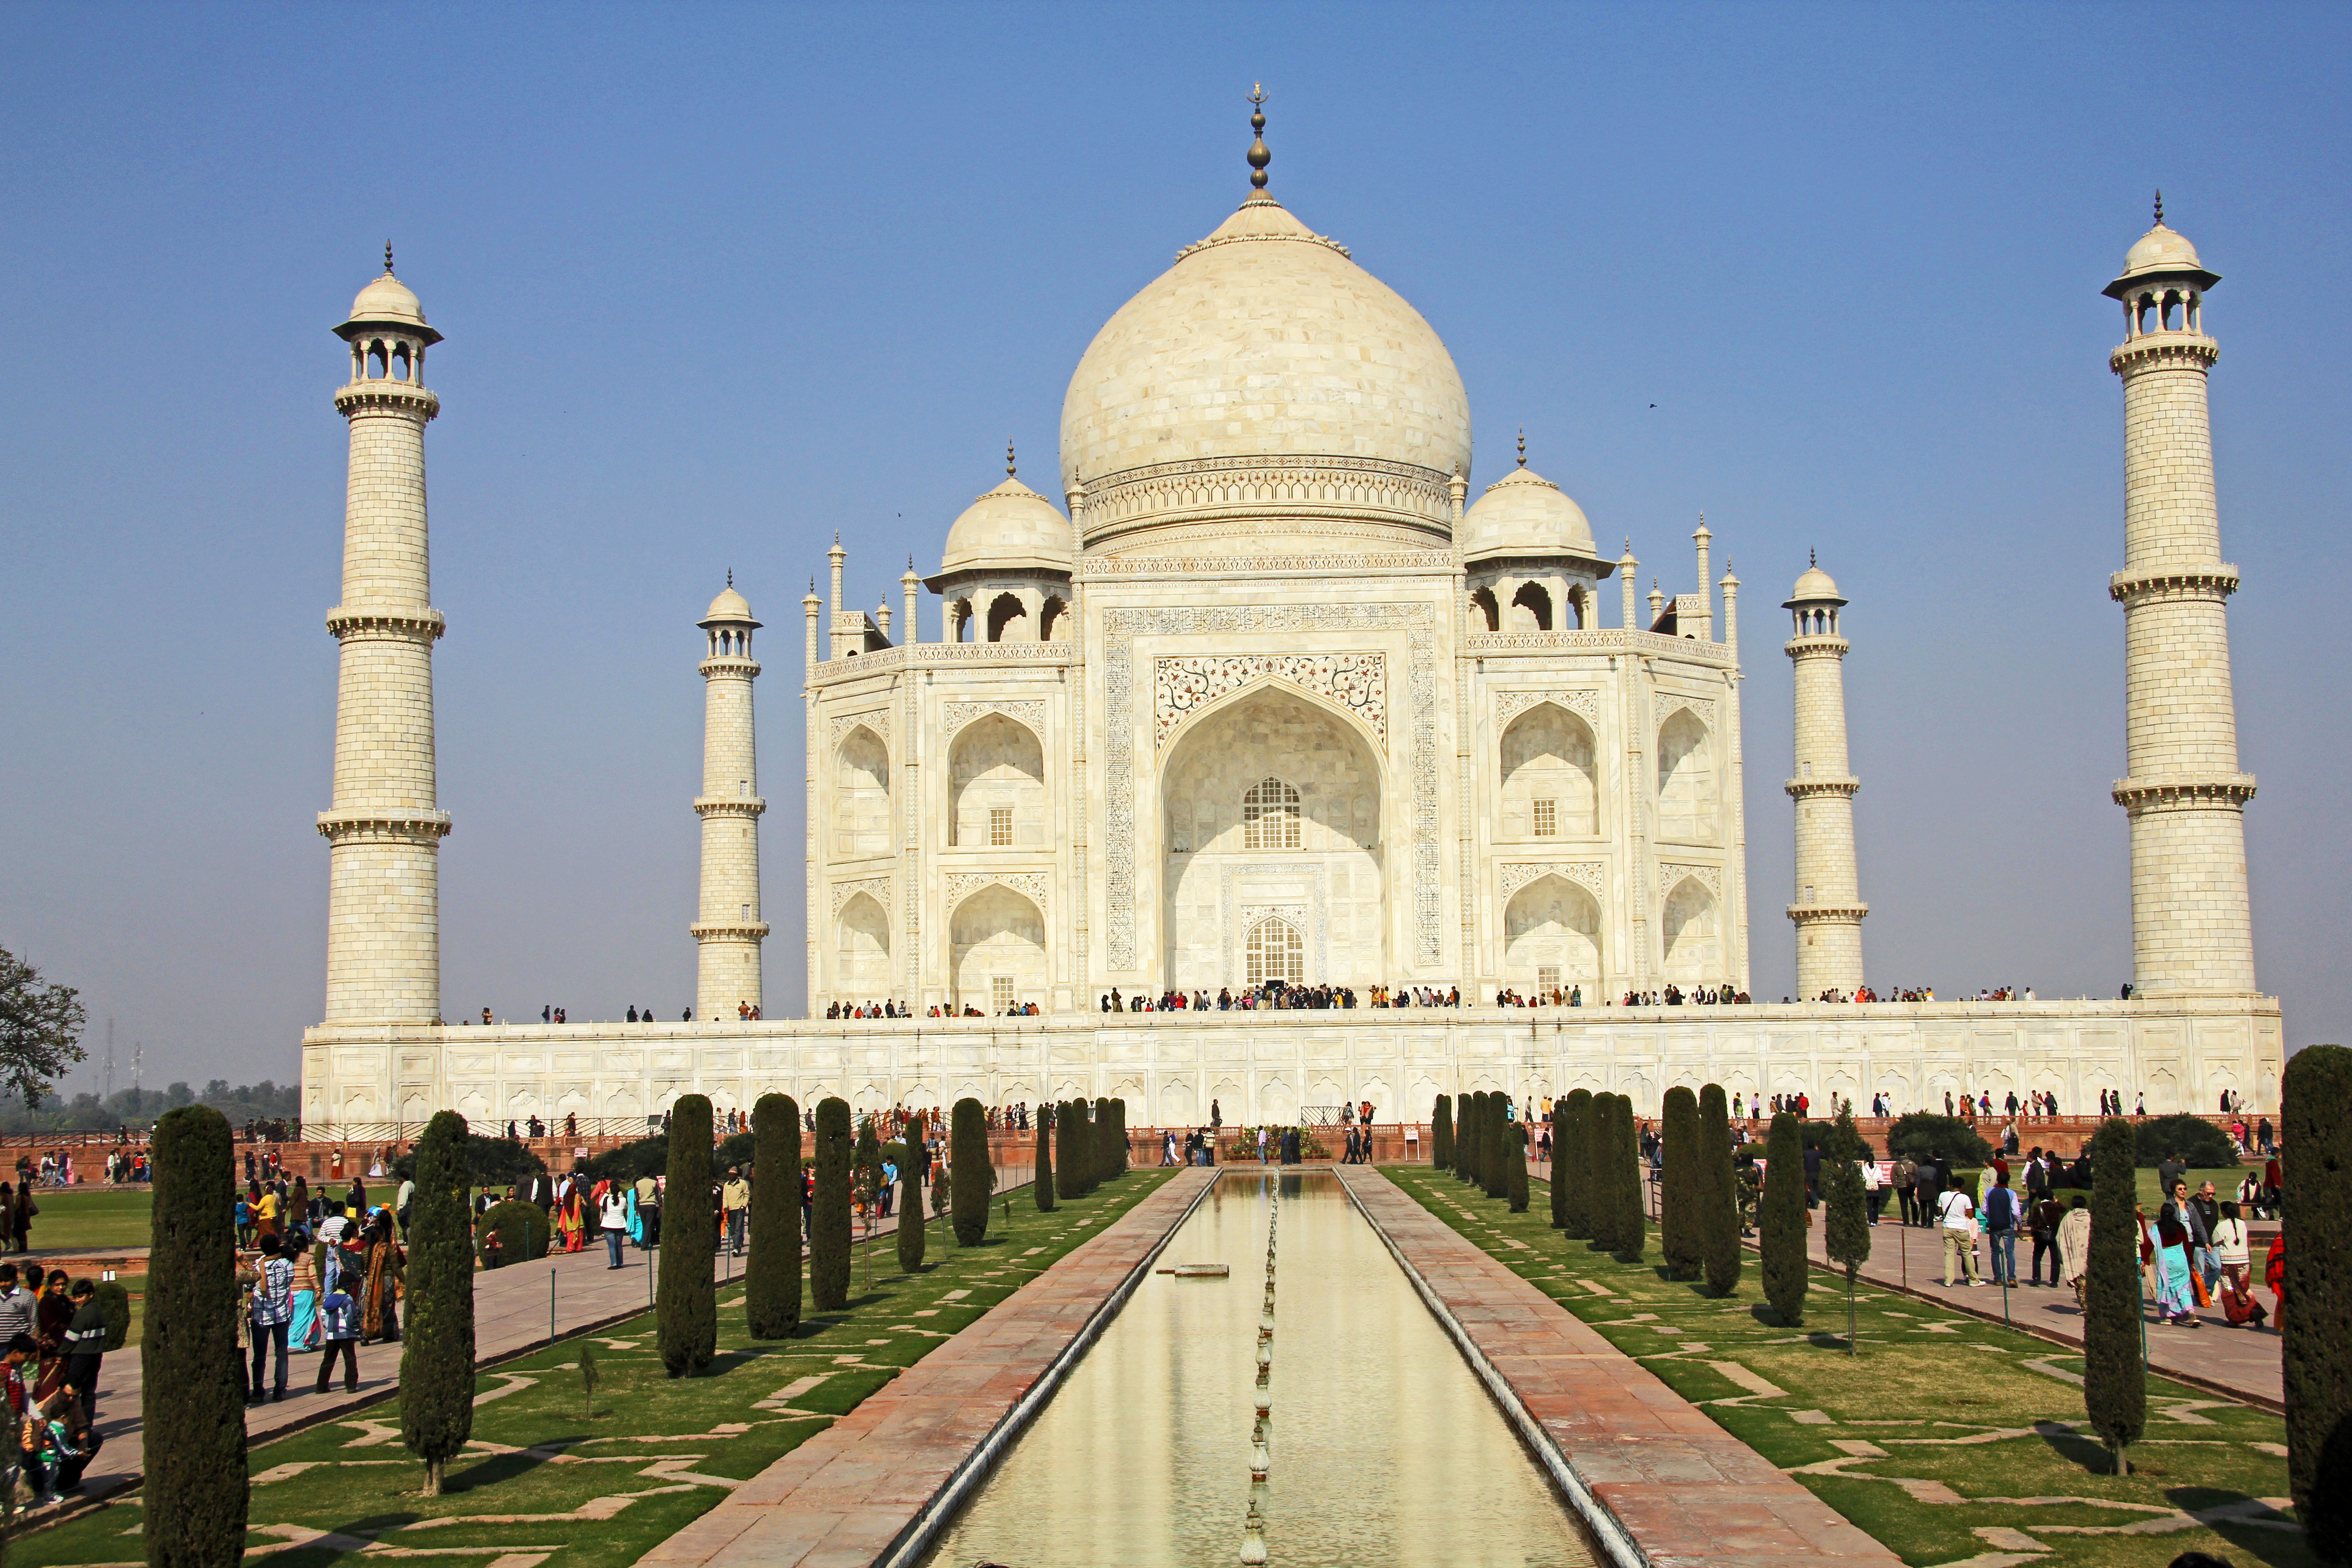 Taj Mahal © JonoVernon-Powell.com